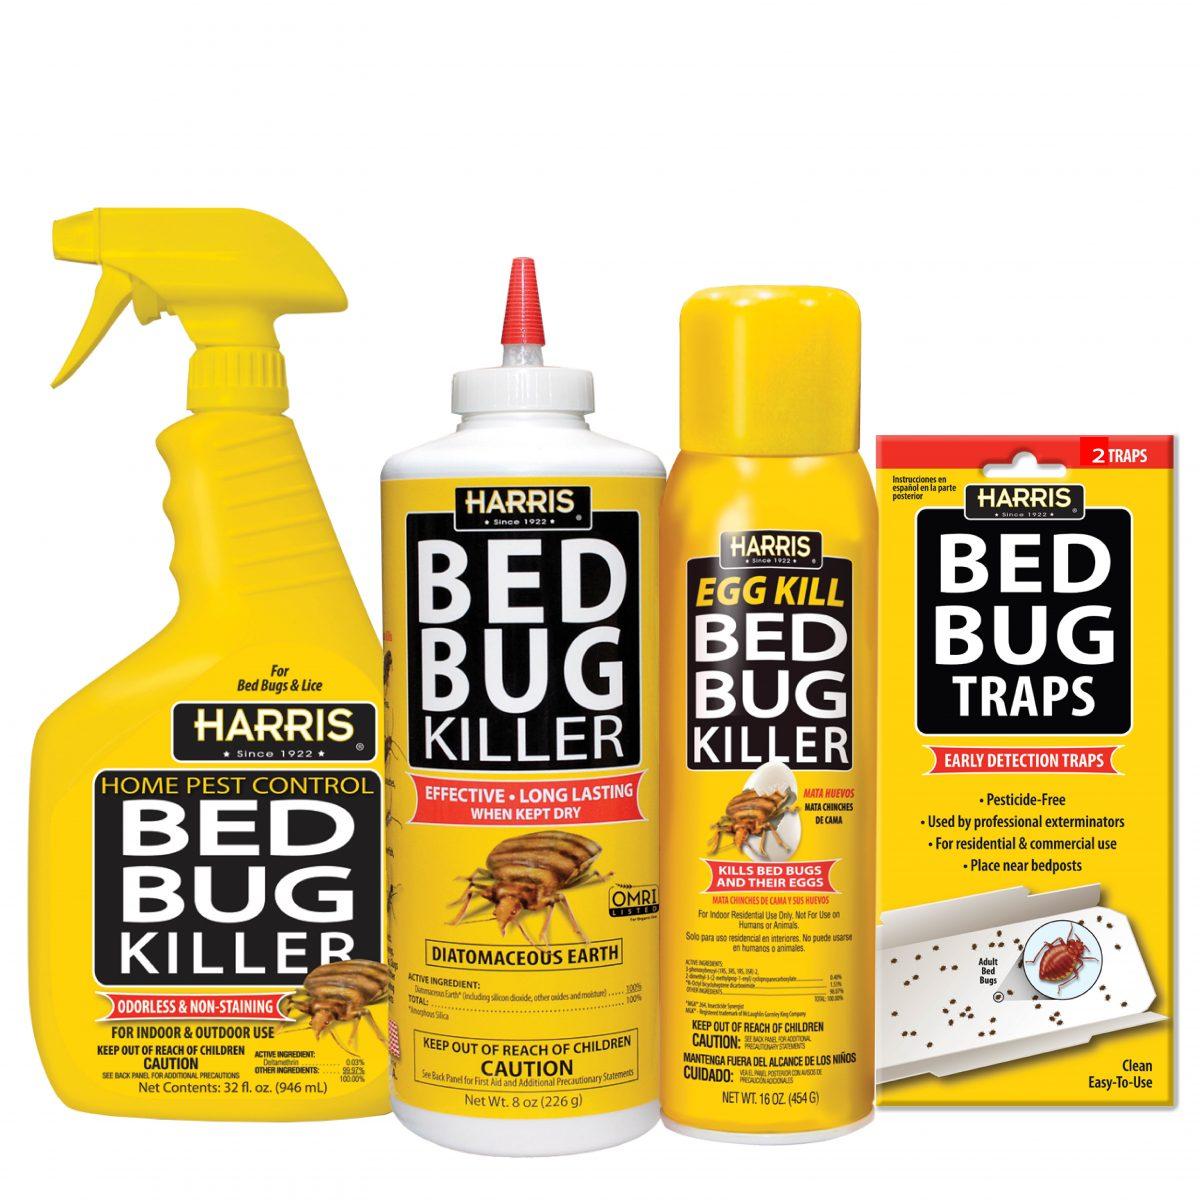 Harris Bed Bug Killer, Bed Bug Spray